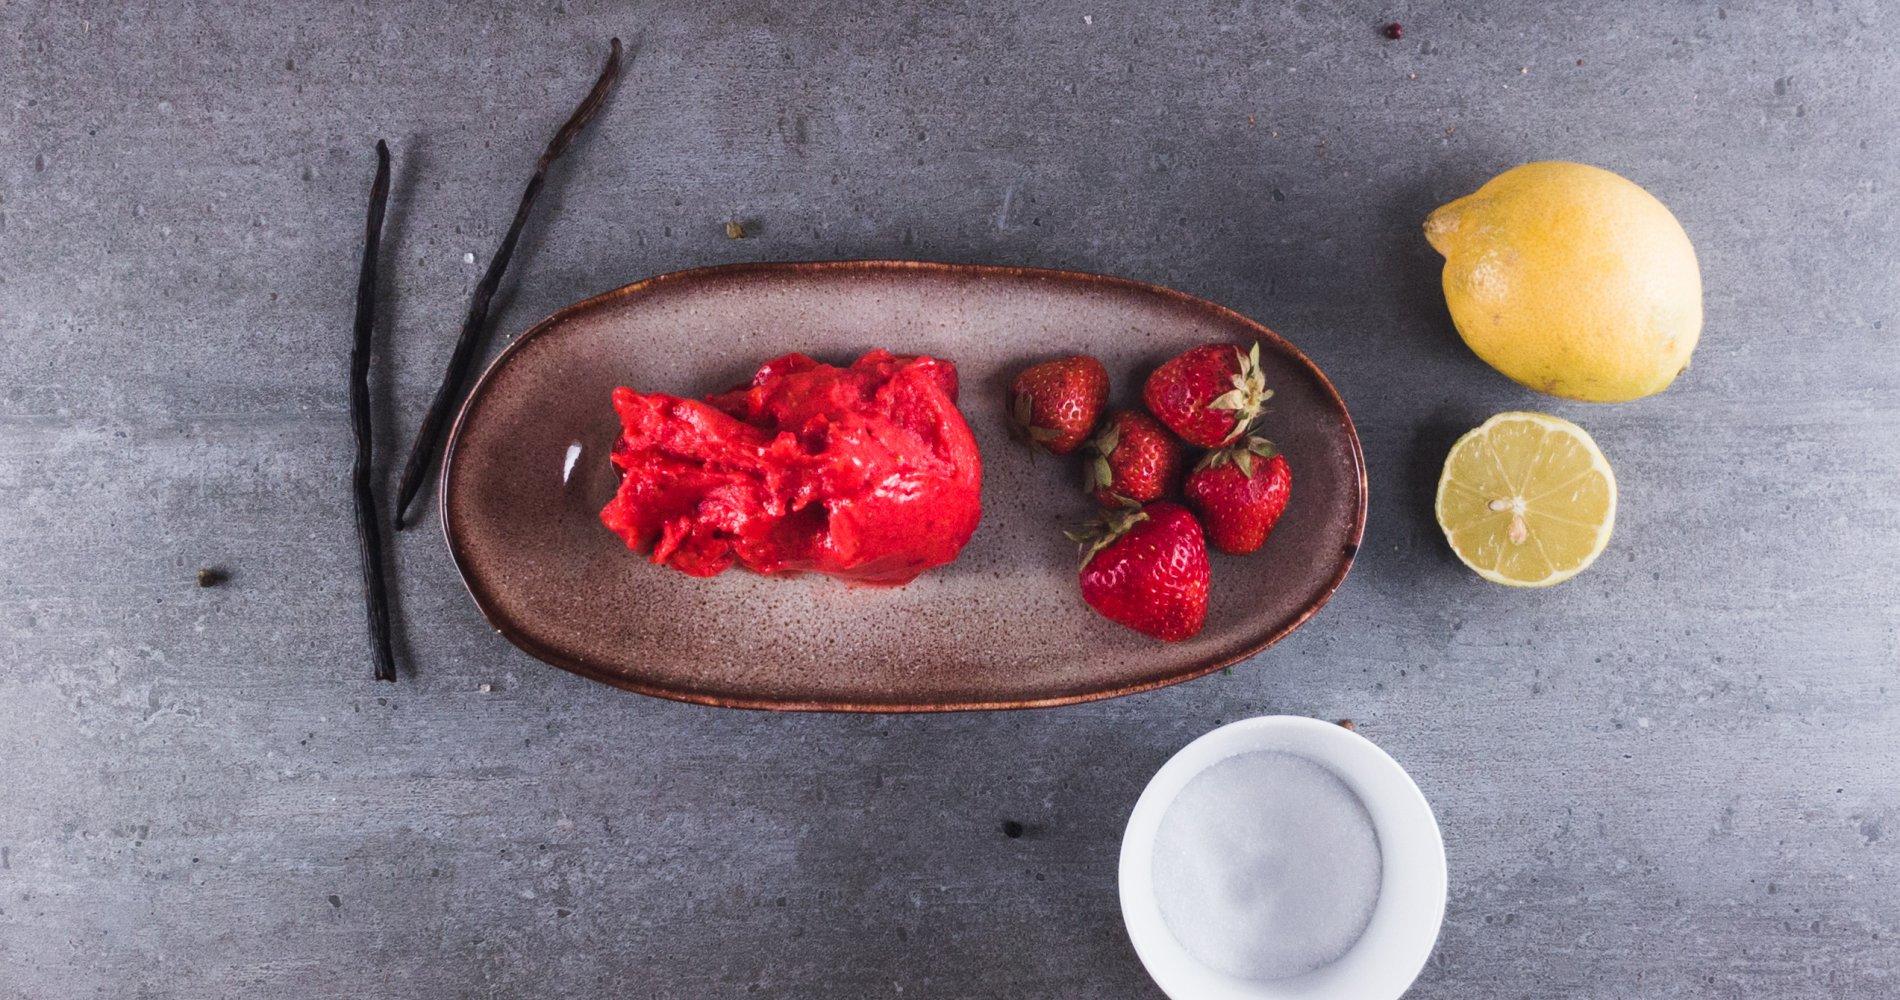 Rezept Low Carb: Erdbeersorbet mit Zitrone - LCHF-gesund.de